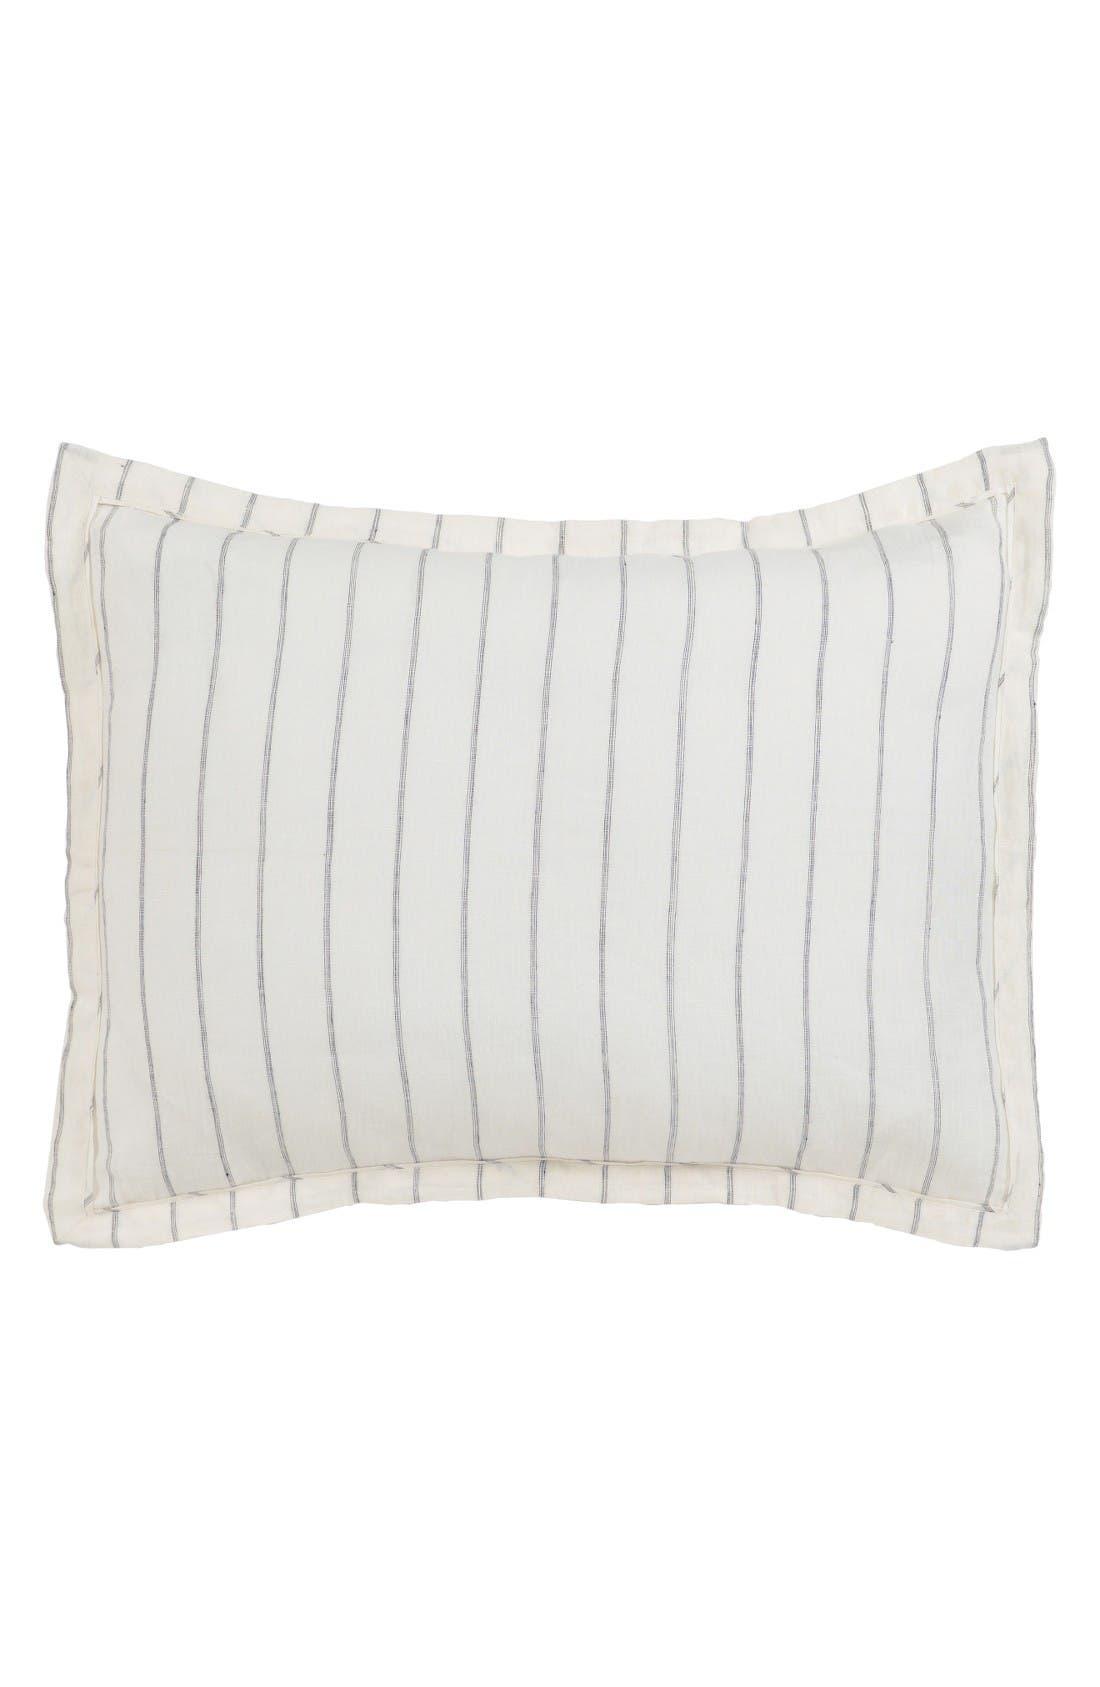 Pinstripe Linen Standard Sham,                             Main thumbnail 1, color,                             Ivory/ Charcoal